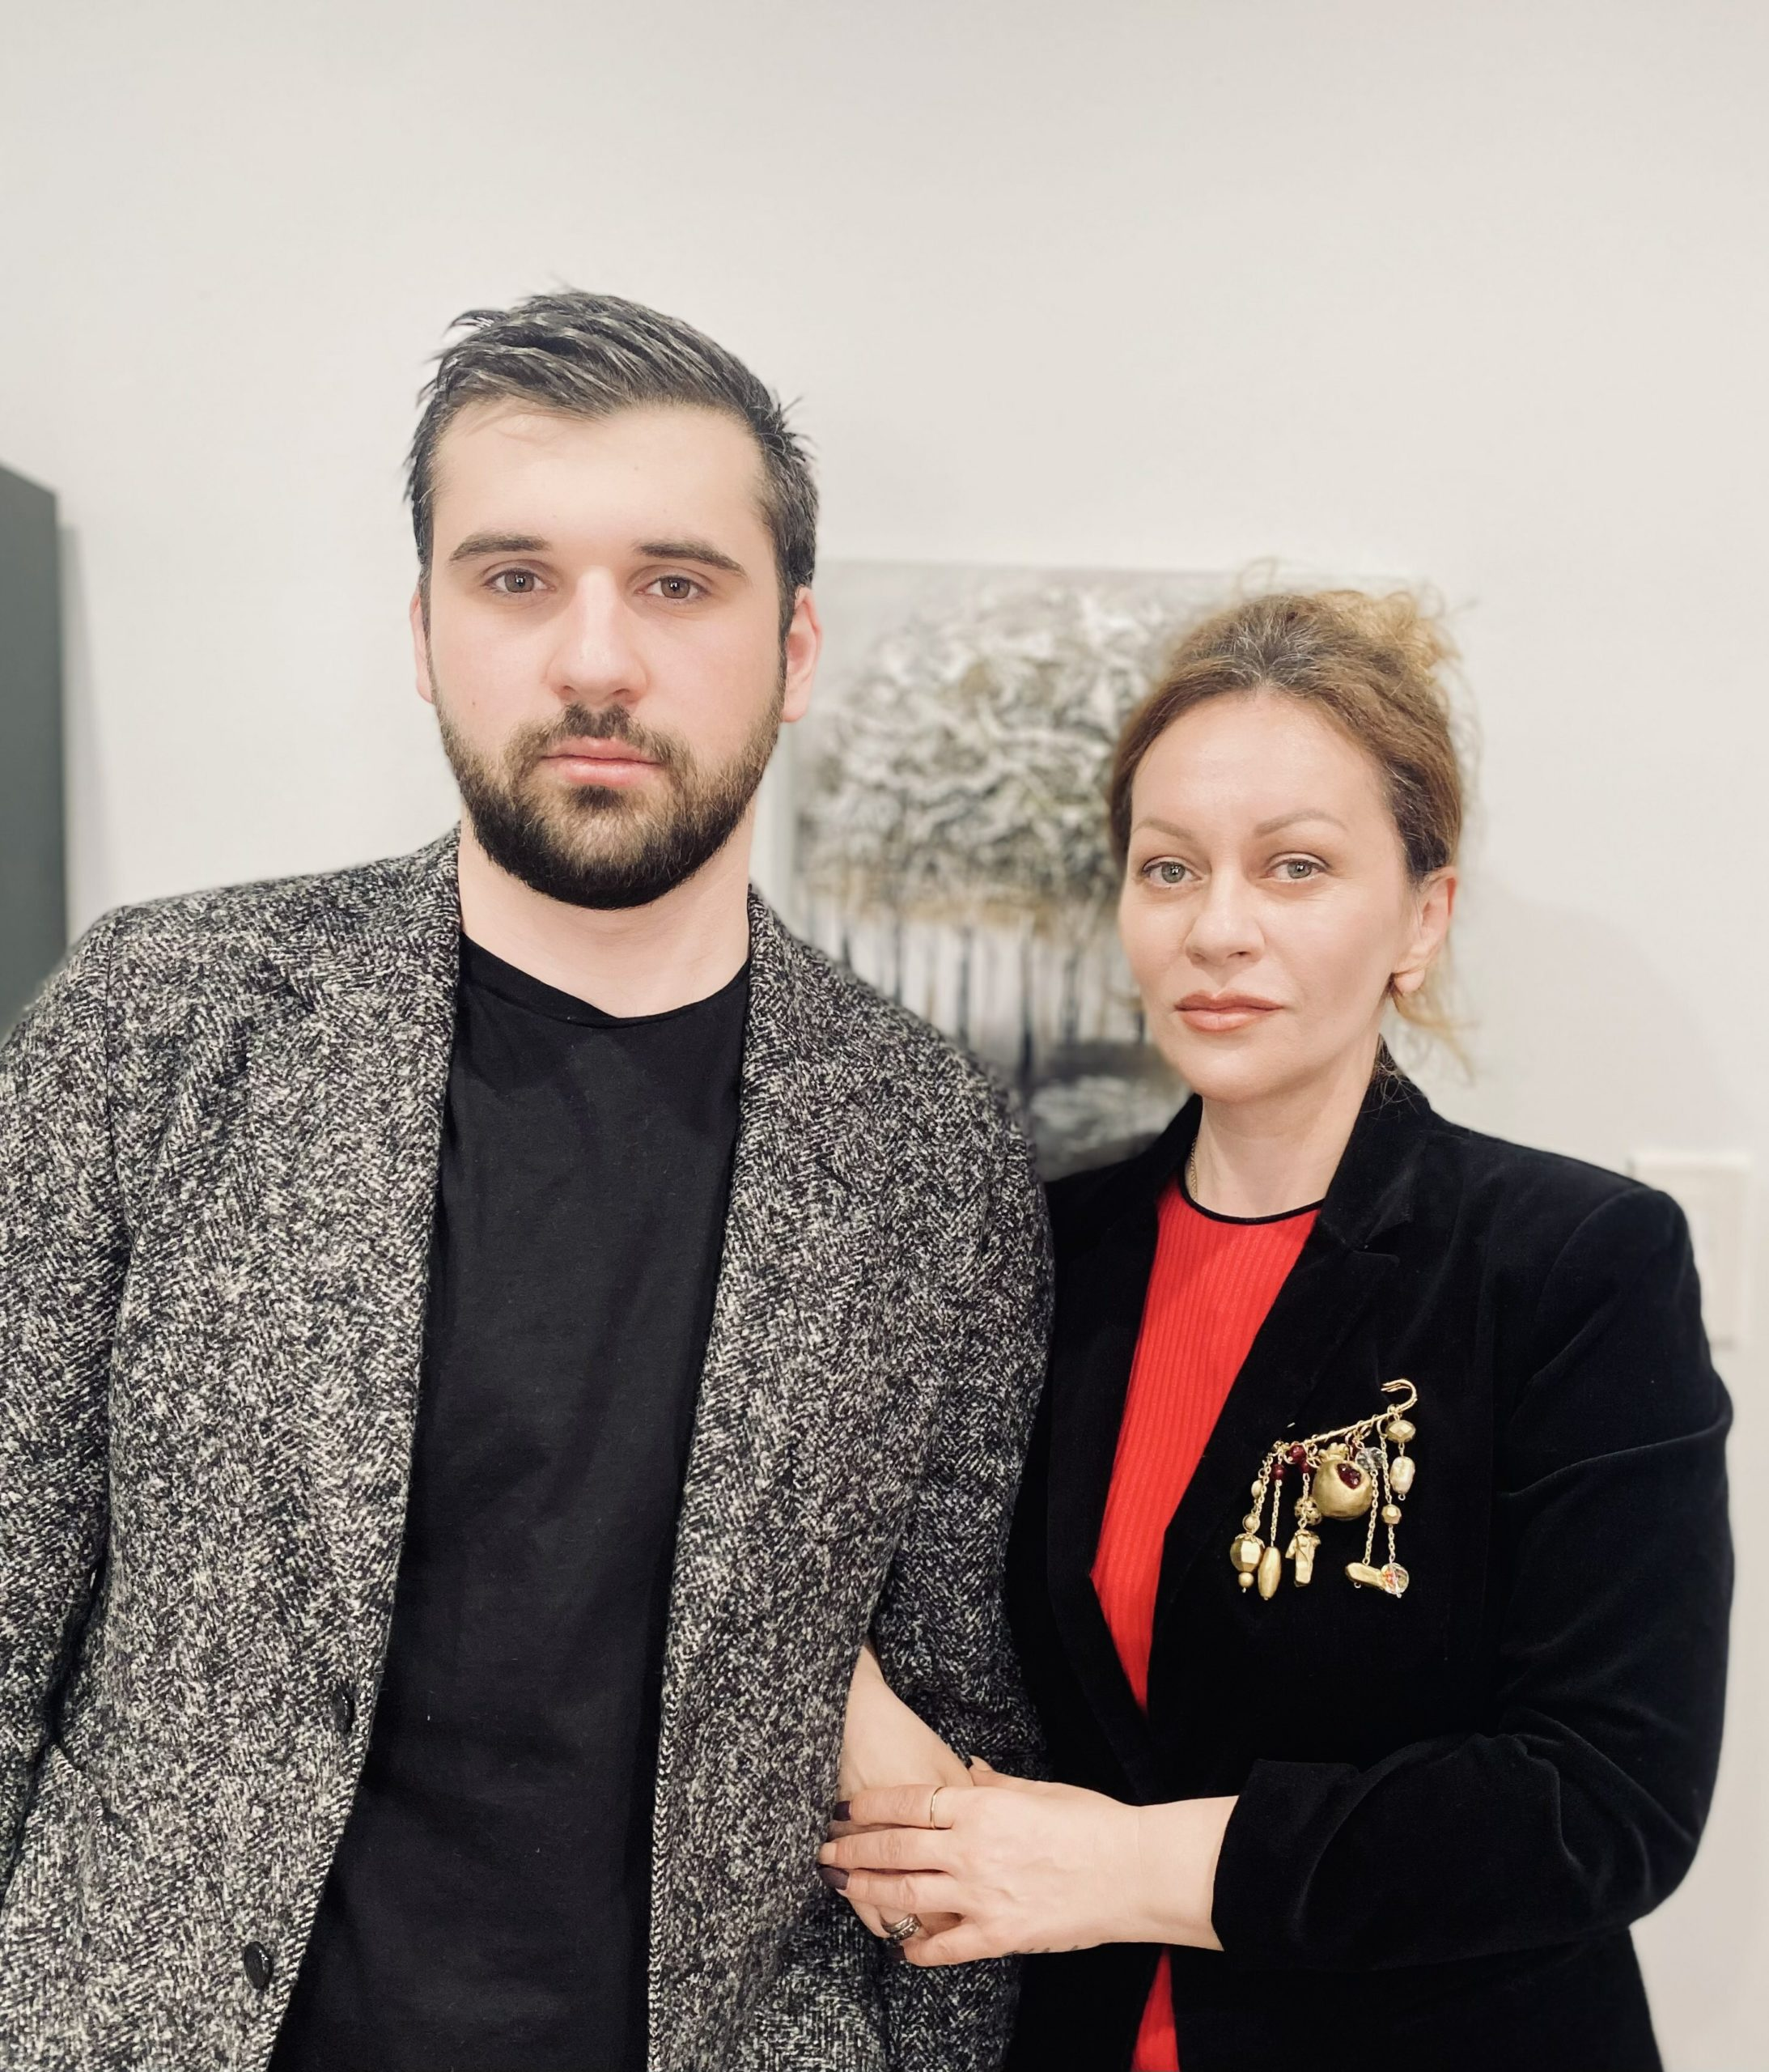 Giorgi Adamashvili and Maka Nikachadze, founders of Hamptons Inclusive Care.